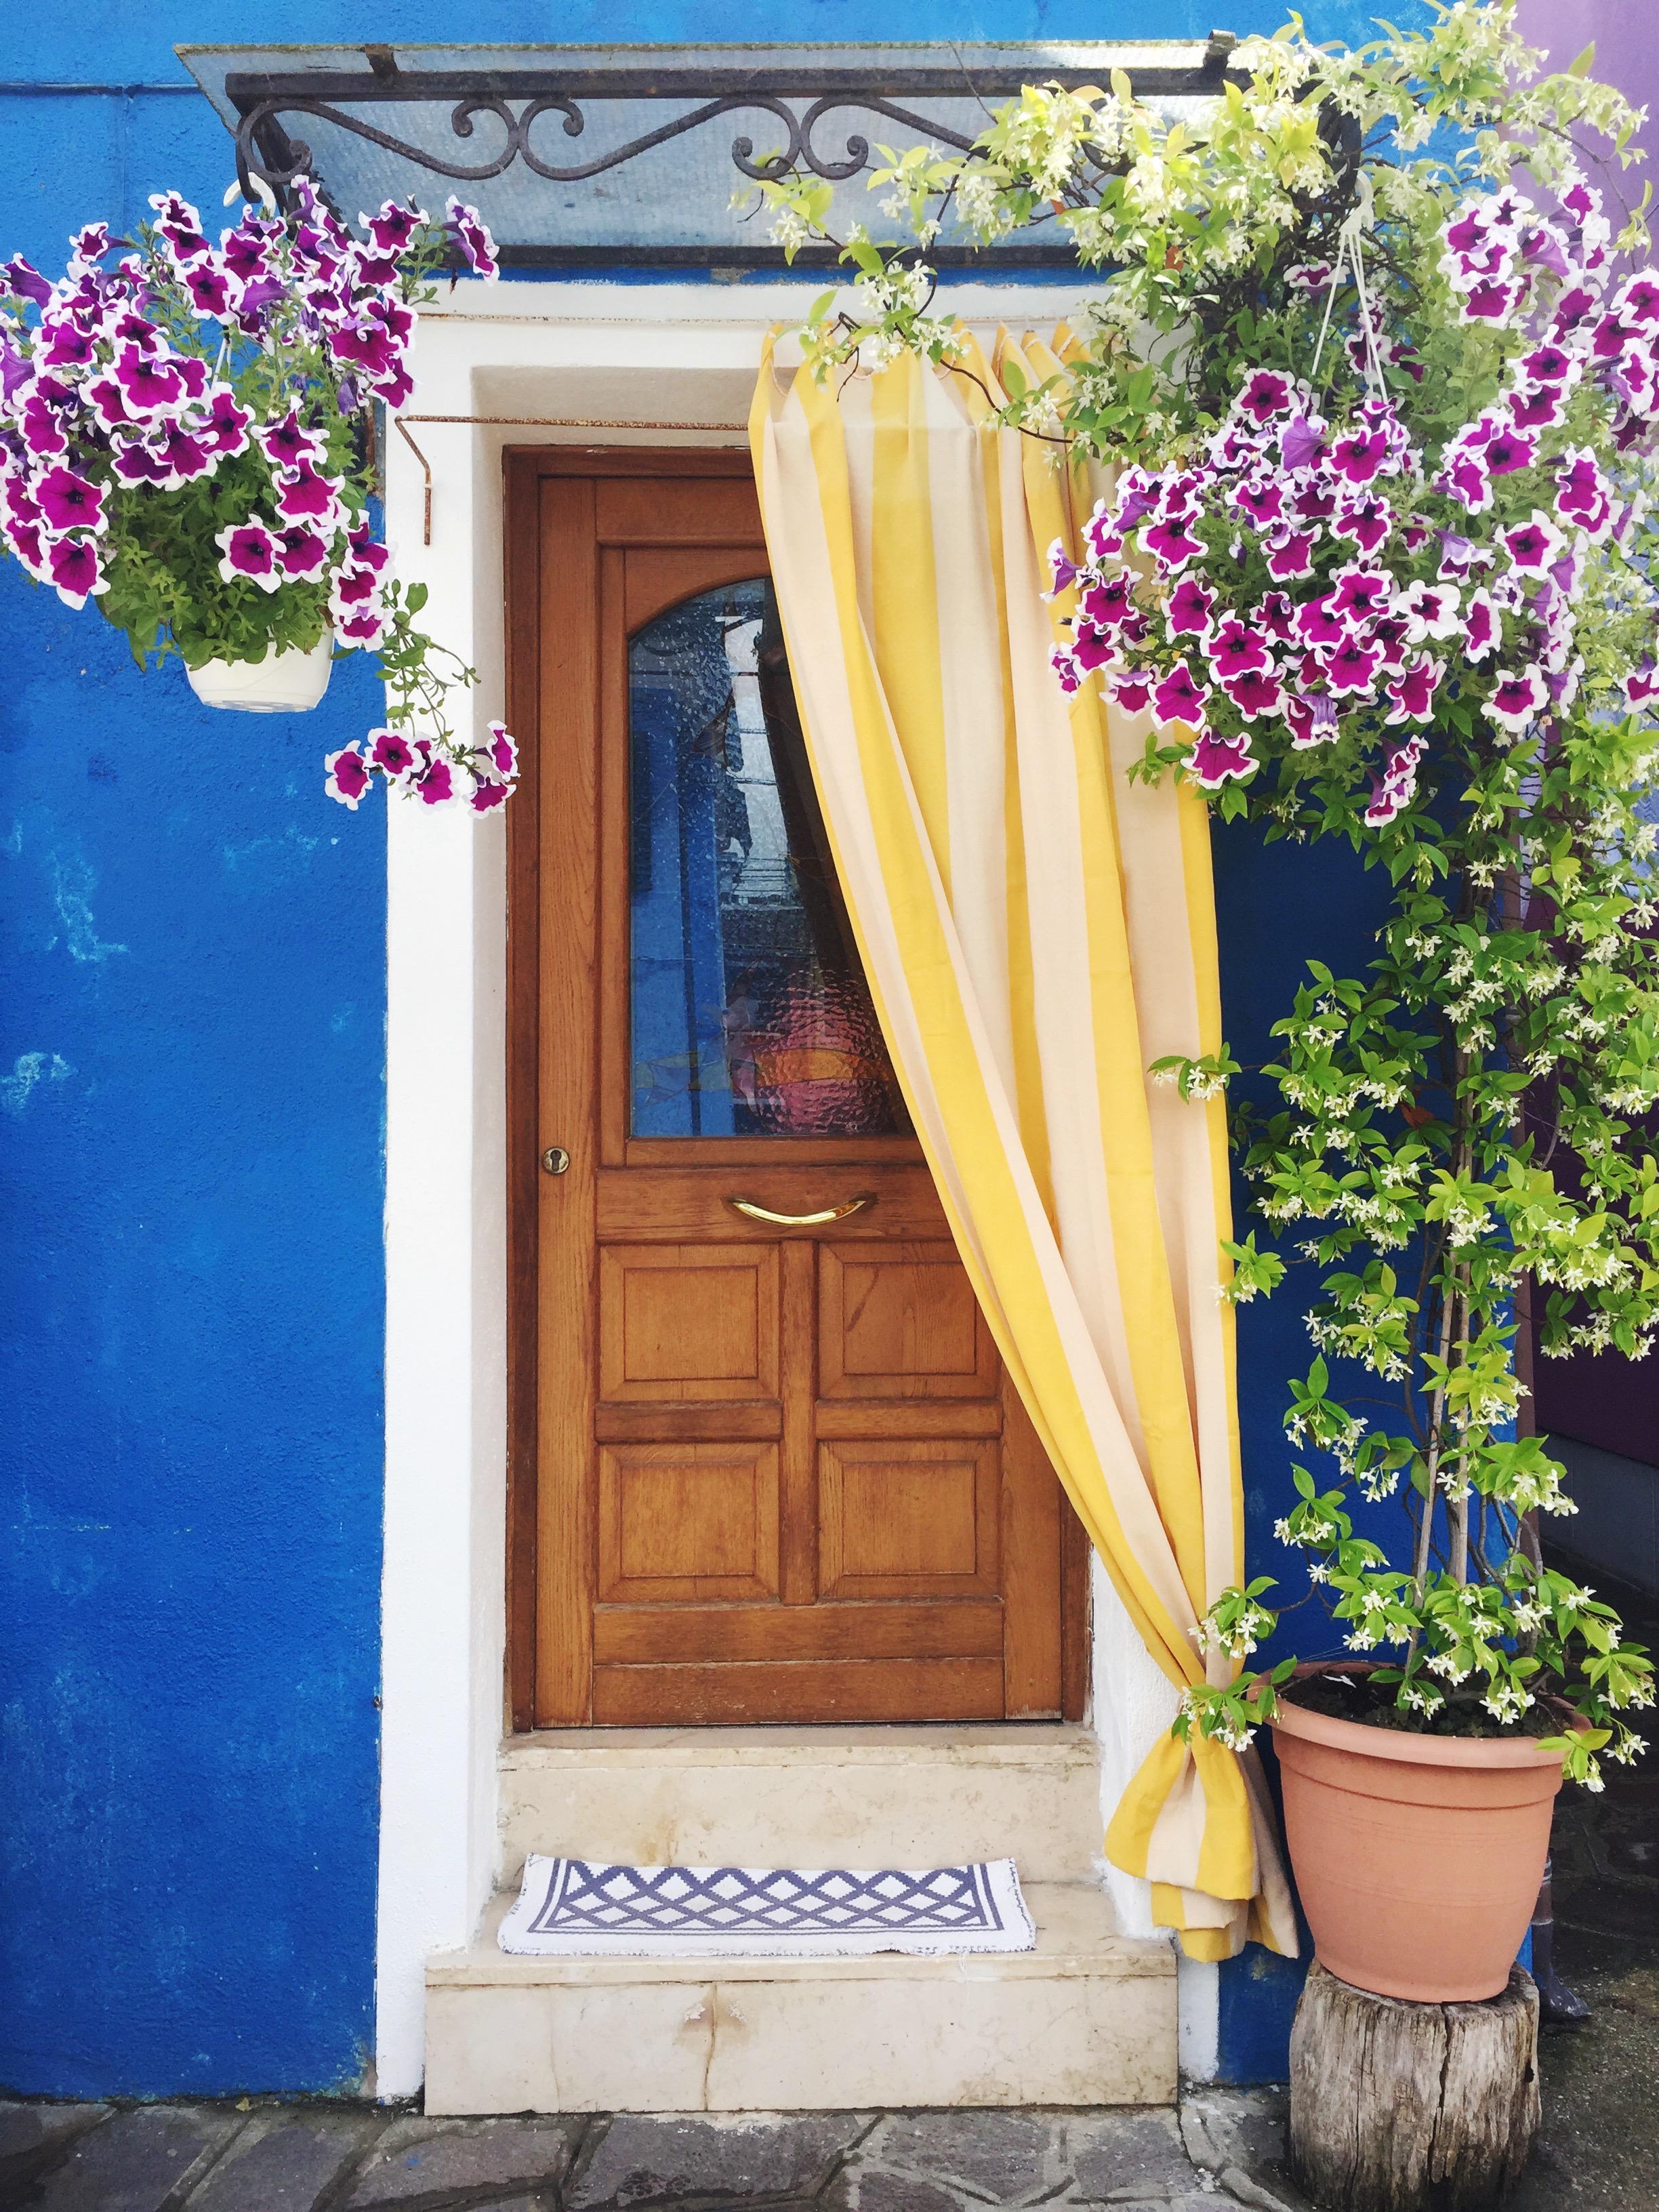 CAPAStudyAbroad_Florence_Summer2016_From_Audra_Jones18.jpg